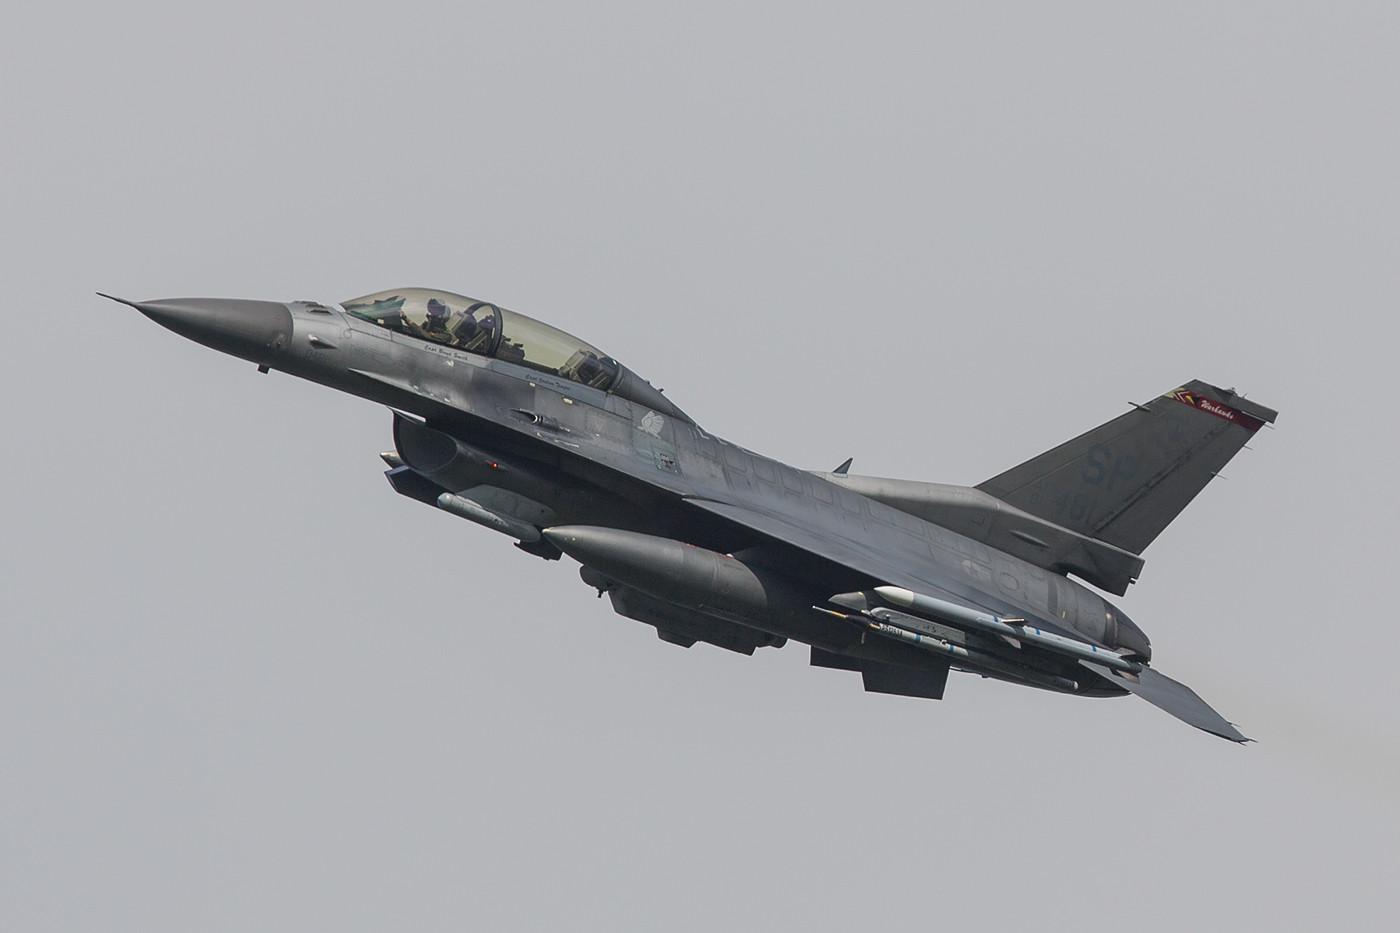 SPM 03.09.2015 91-0418, F-16D, 52nd FW Spangdahlem (Deutschland)